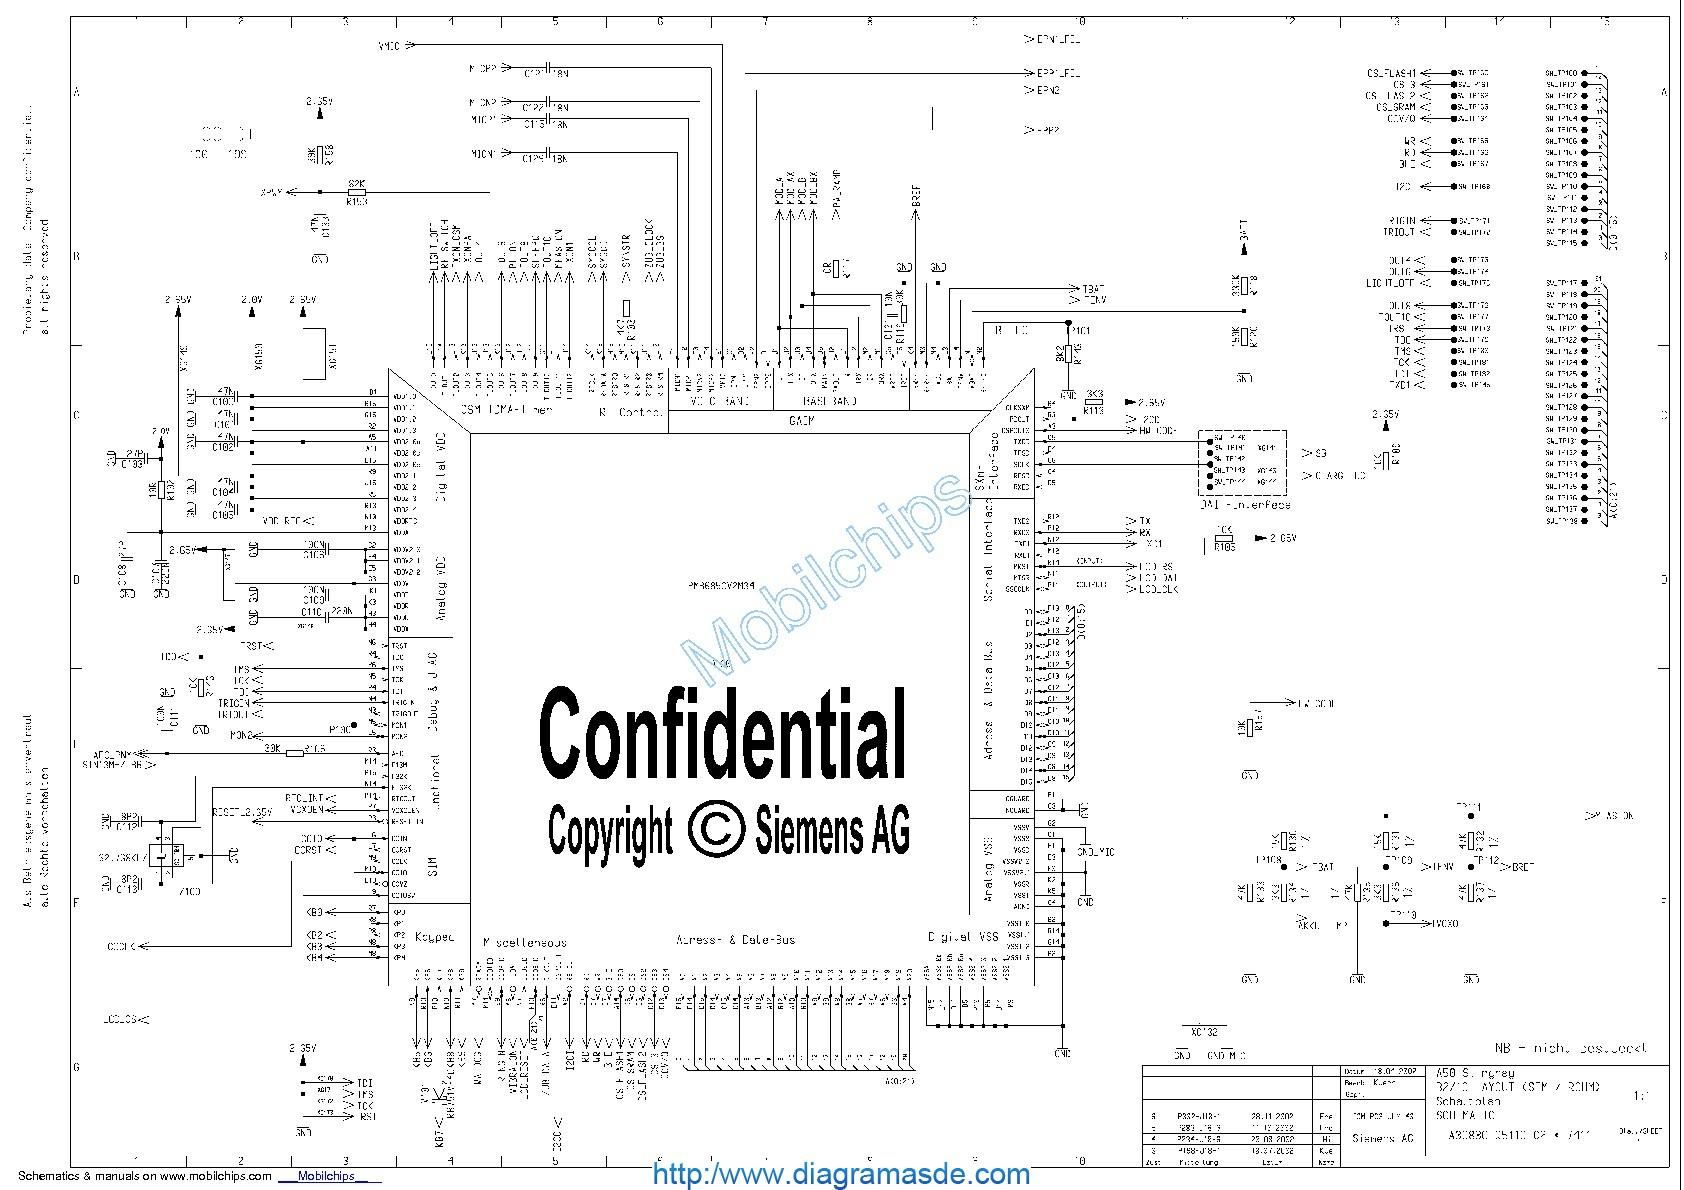 Diagrama Del Celular Siemens A50 Schematics